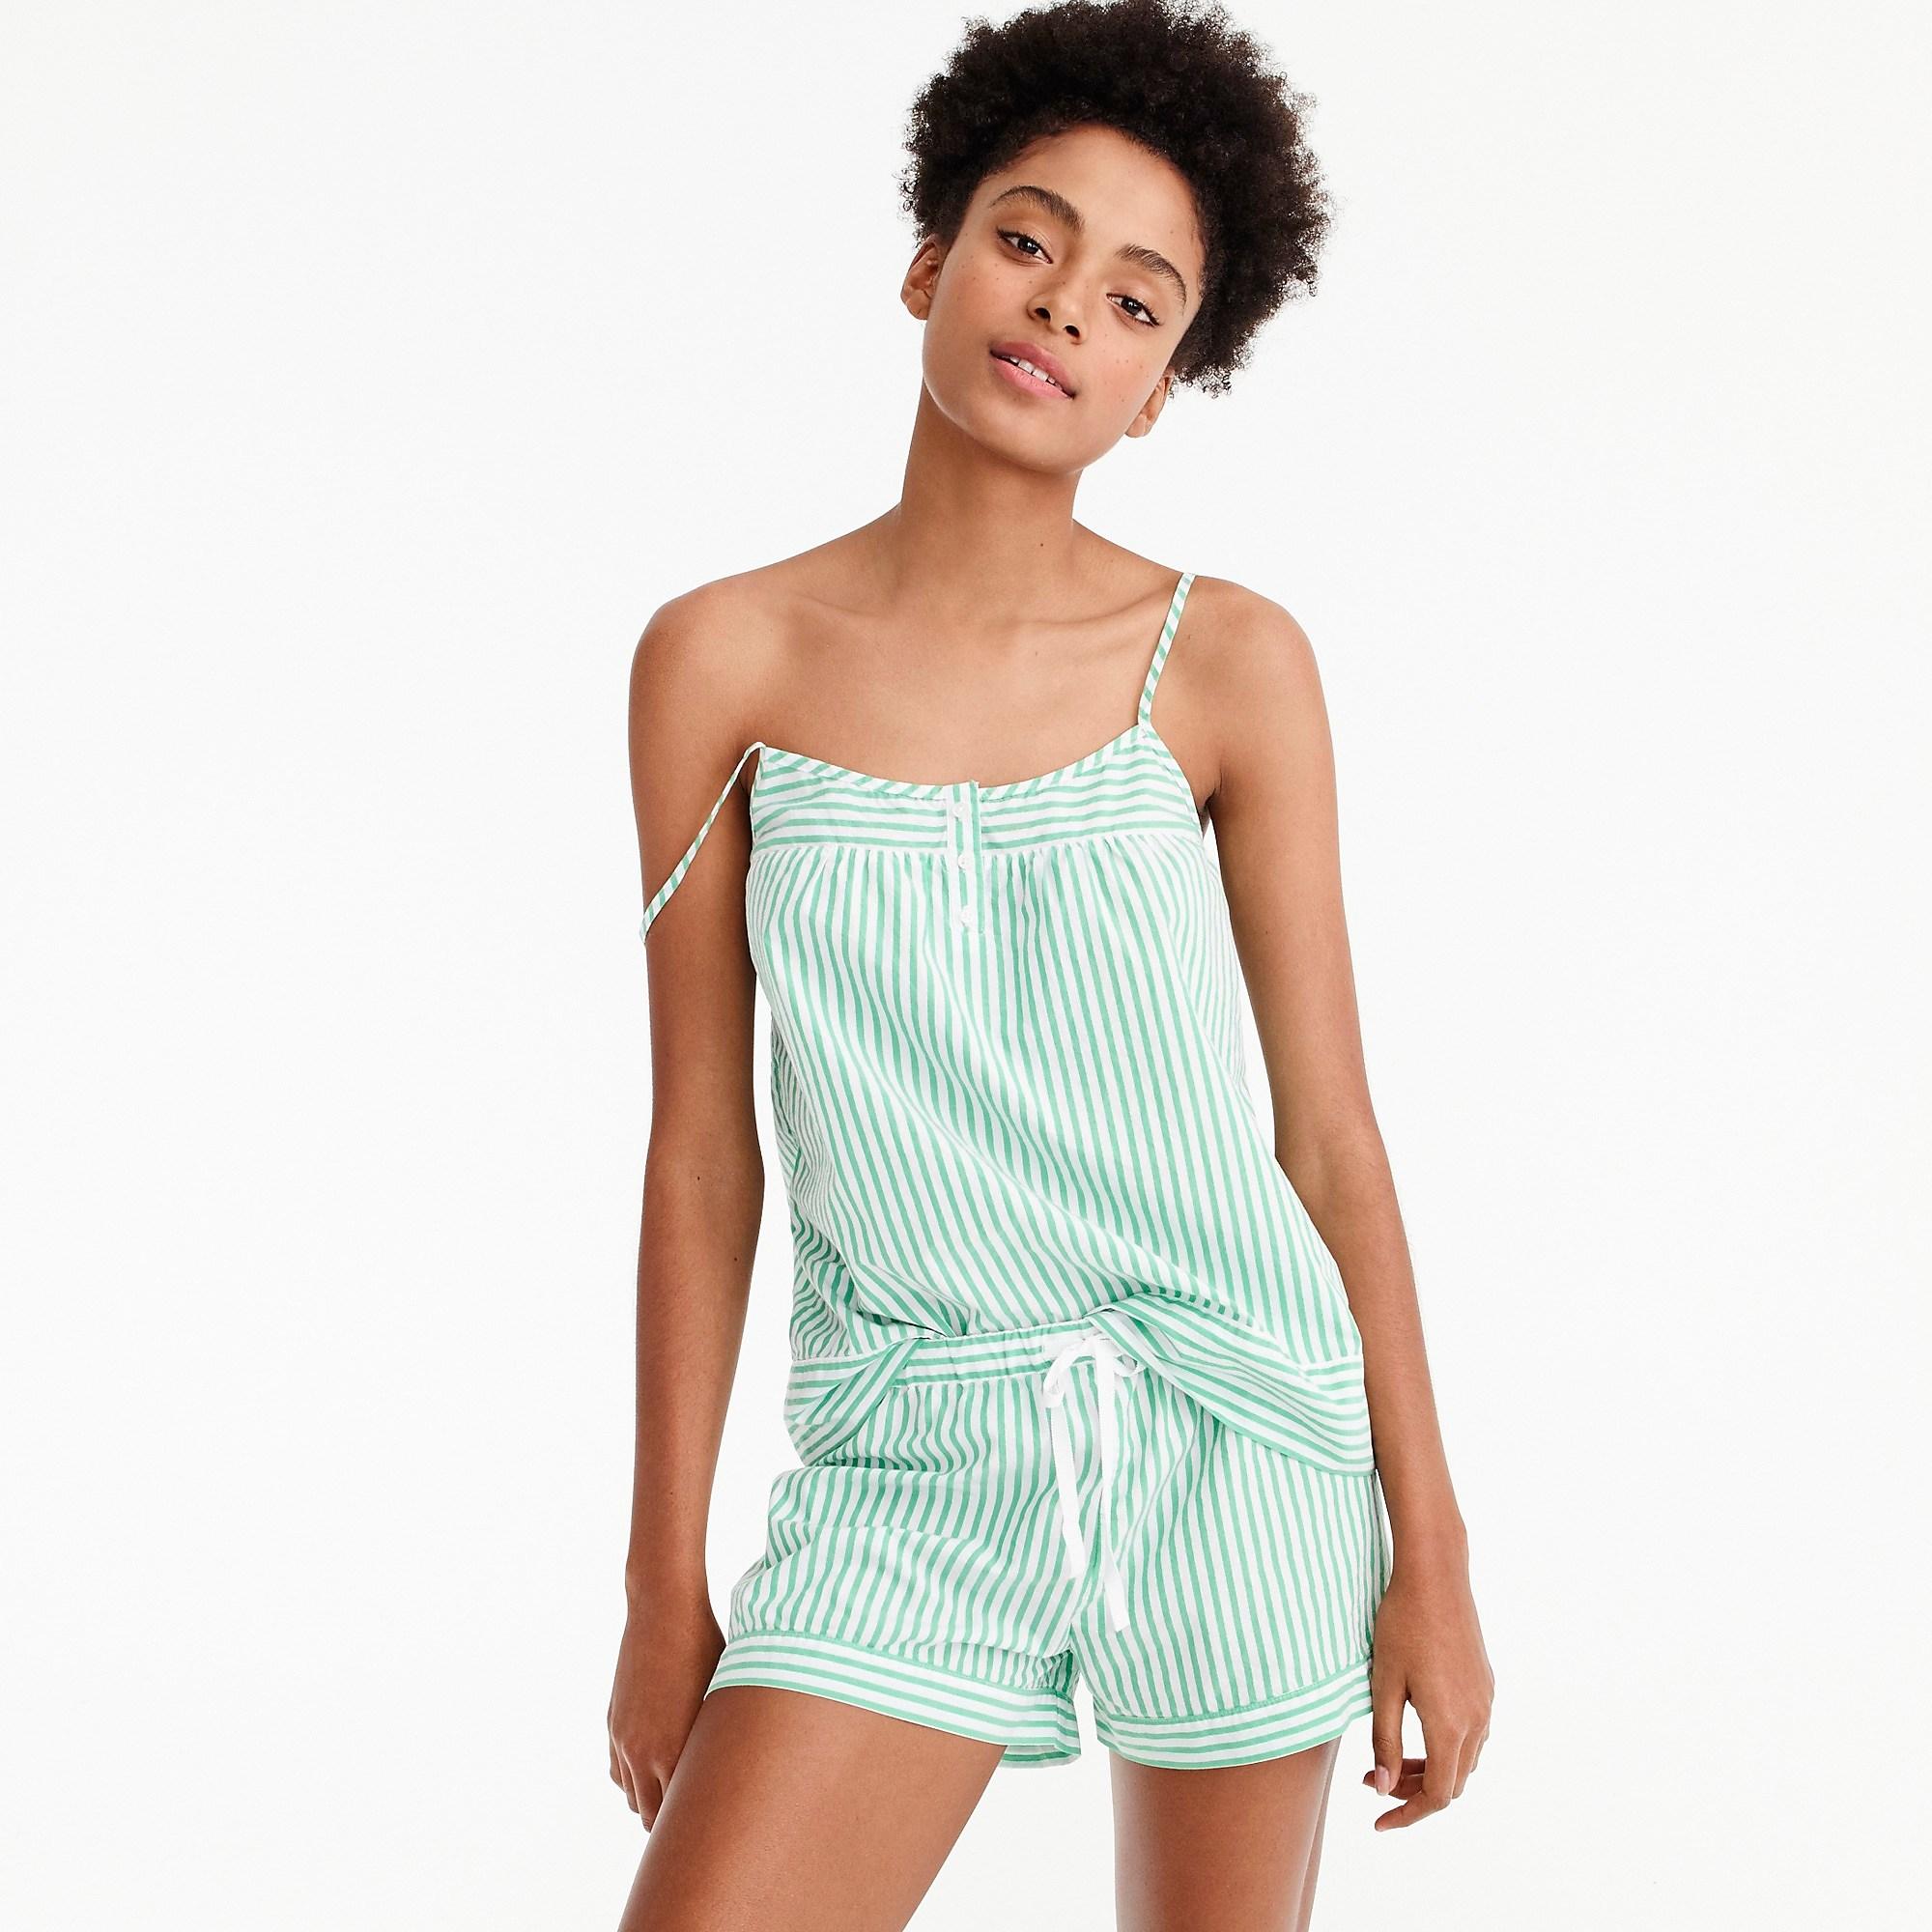 cb9759177b83 10 Summer Pajama Sets You ll Never Want to Take Off - FabFitFun